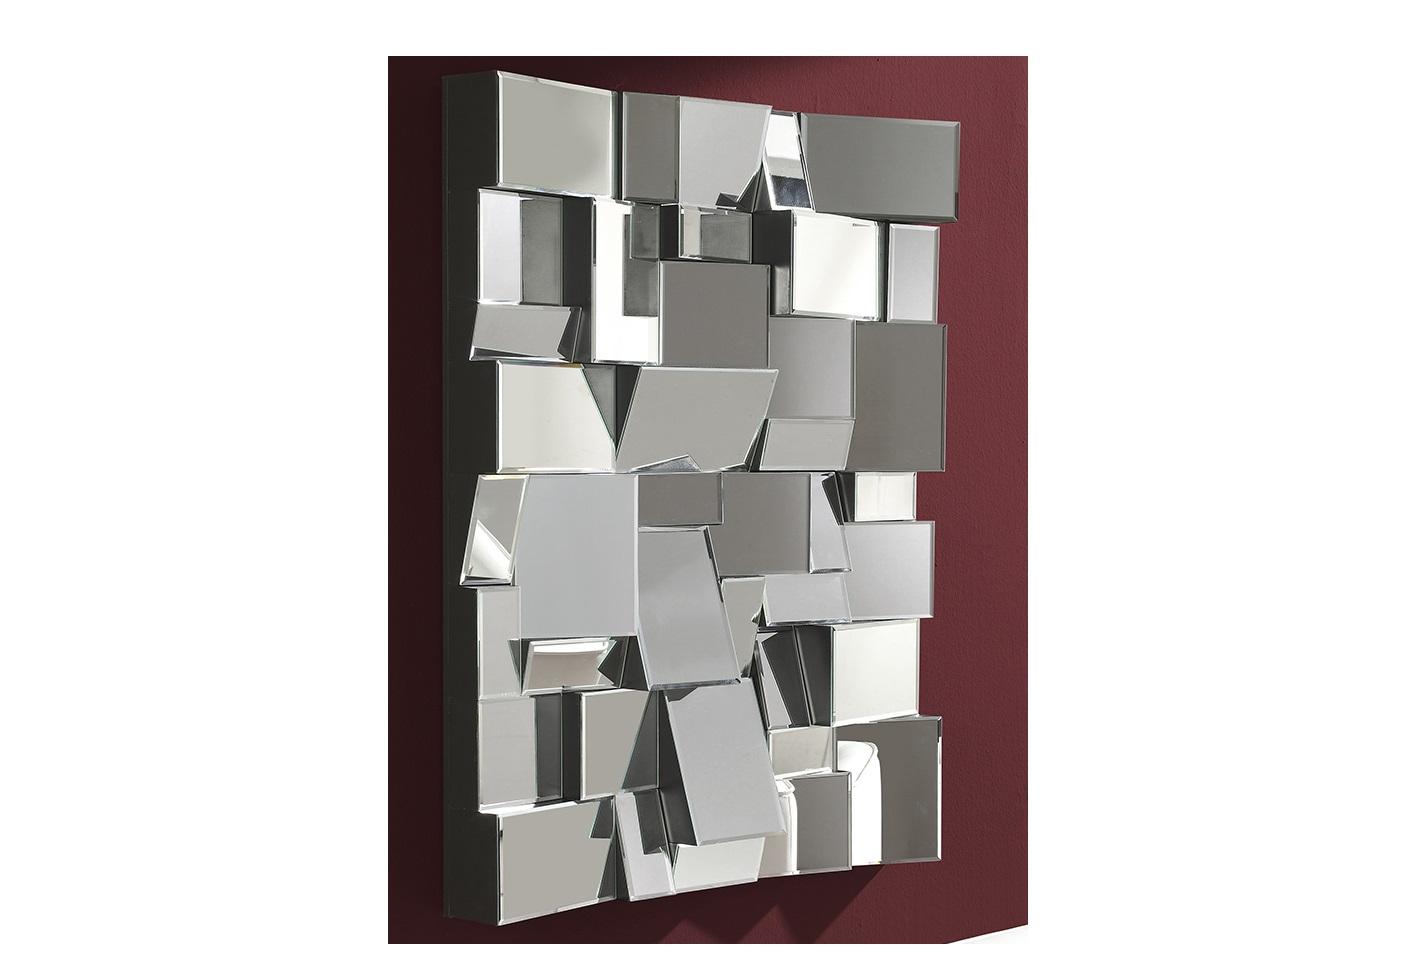 Зеркало dreams (schuller) серебристый 80x120x12 см.